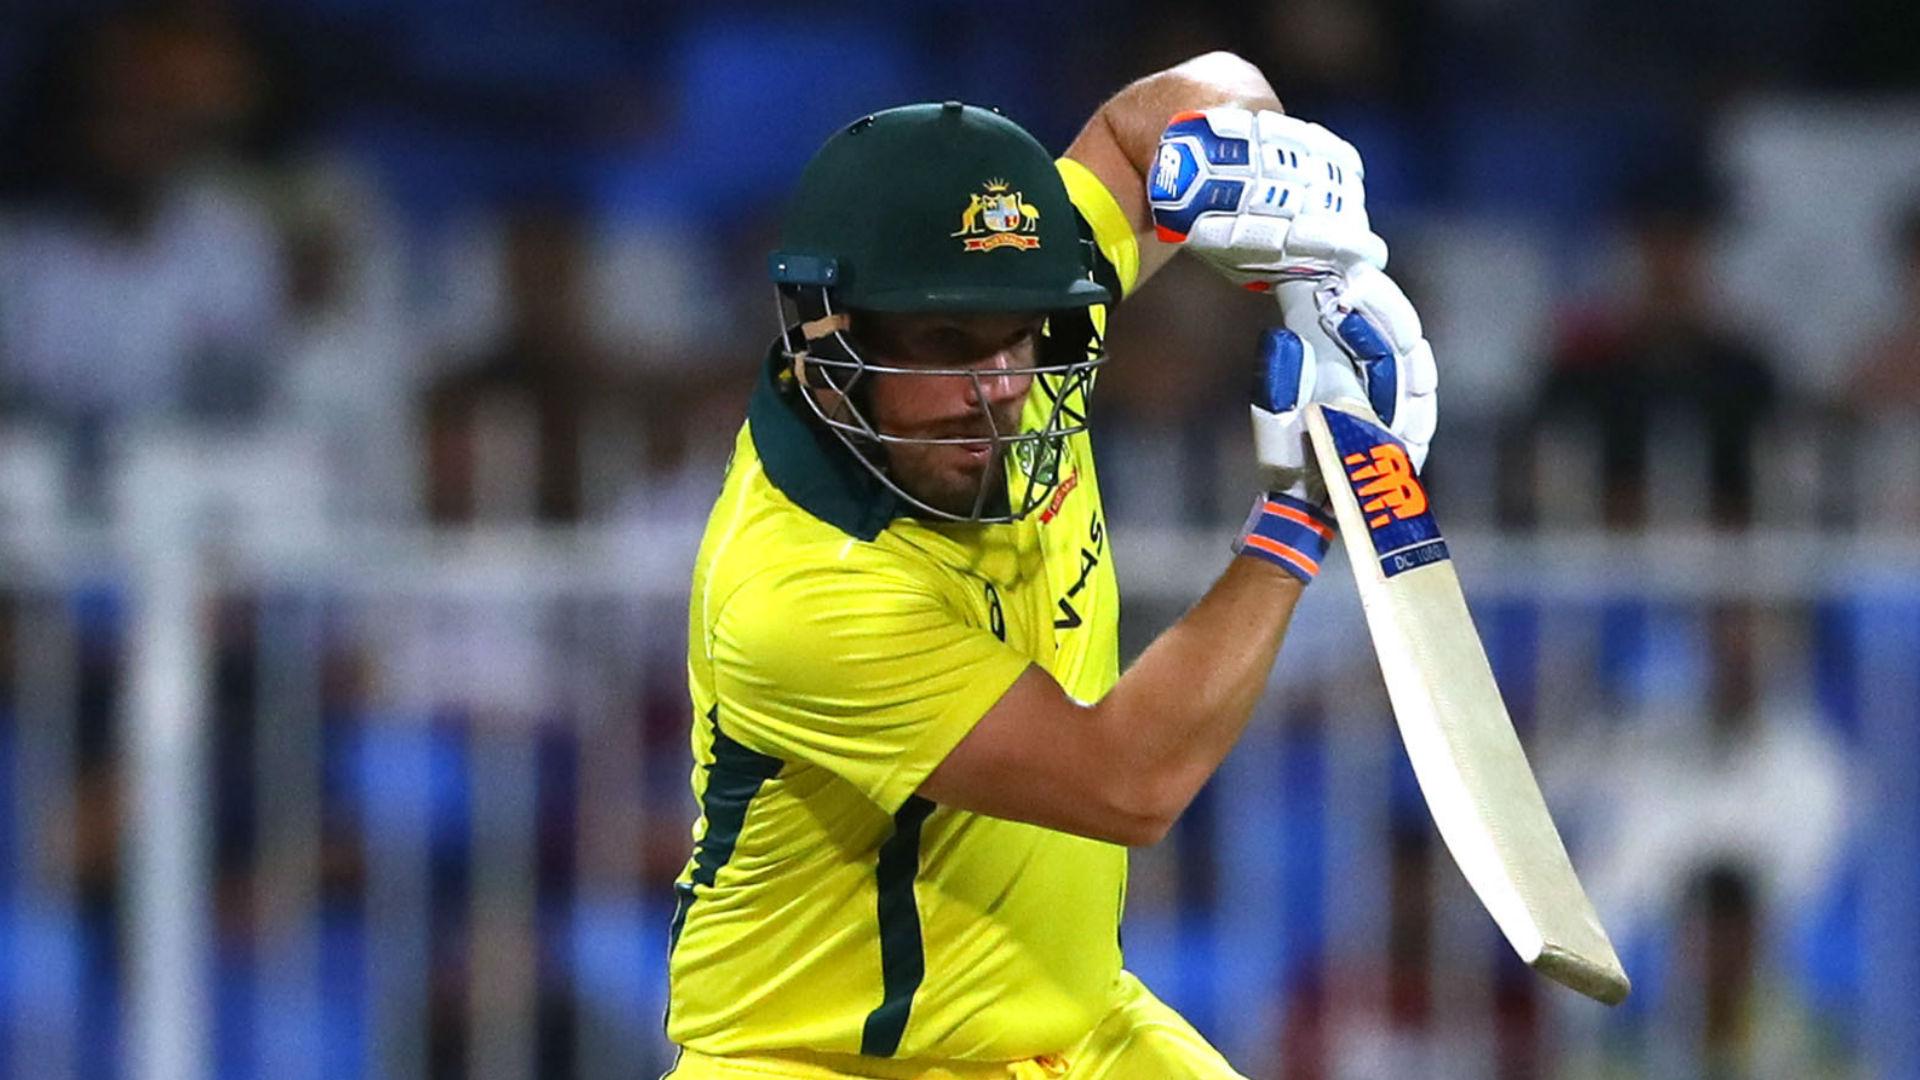 australia vs pakistan - photo #21